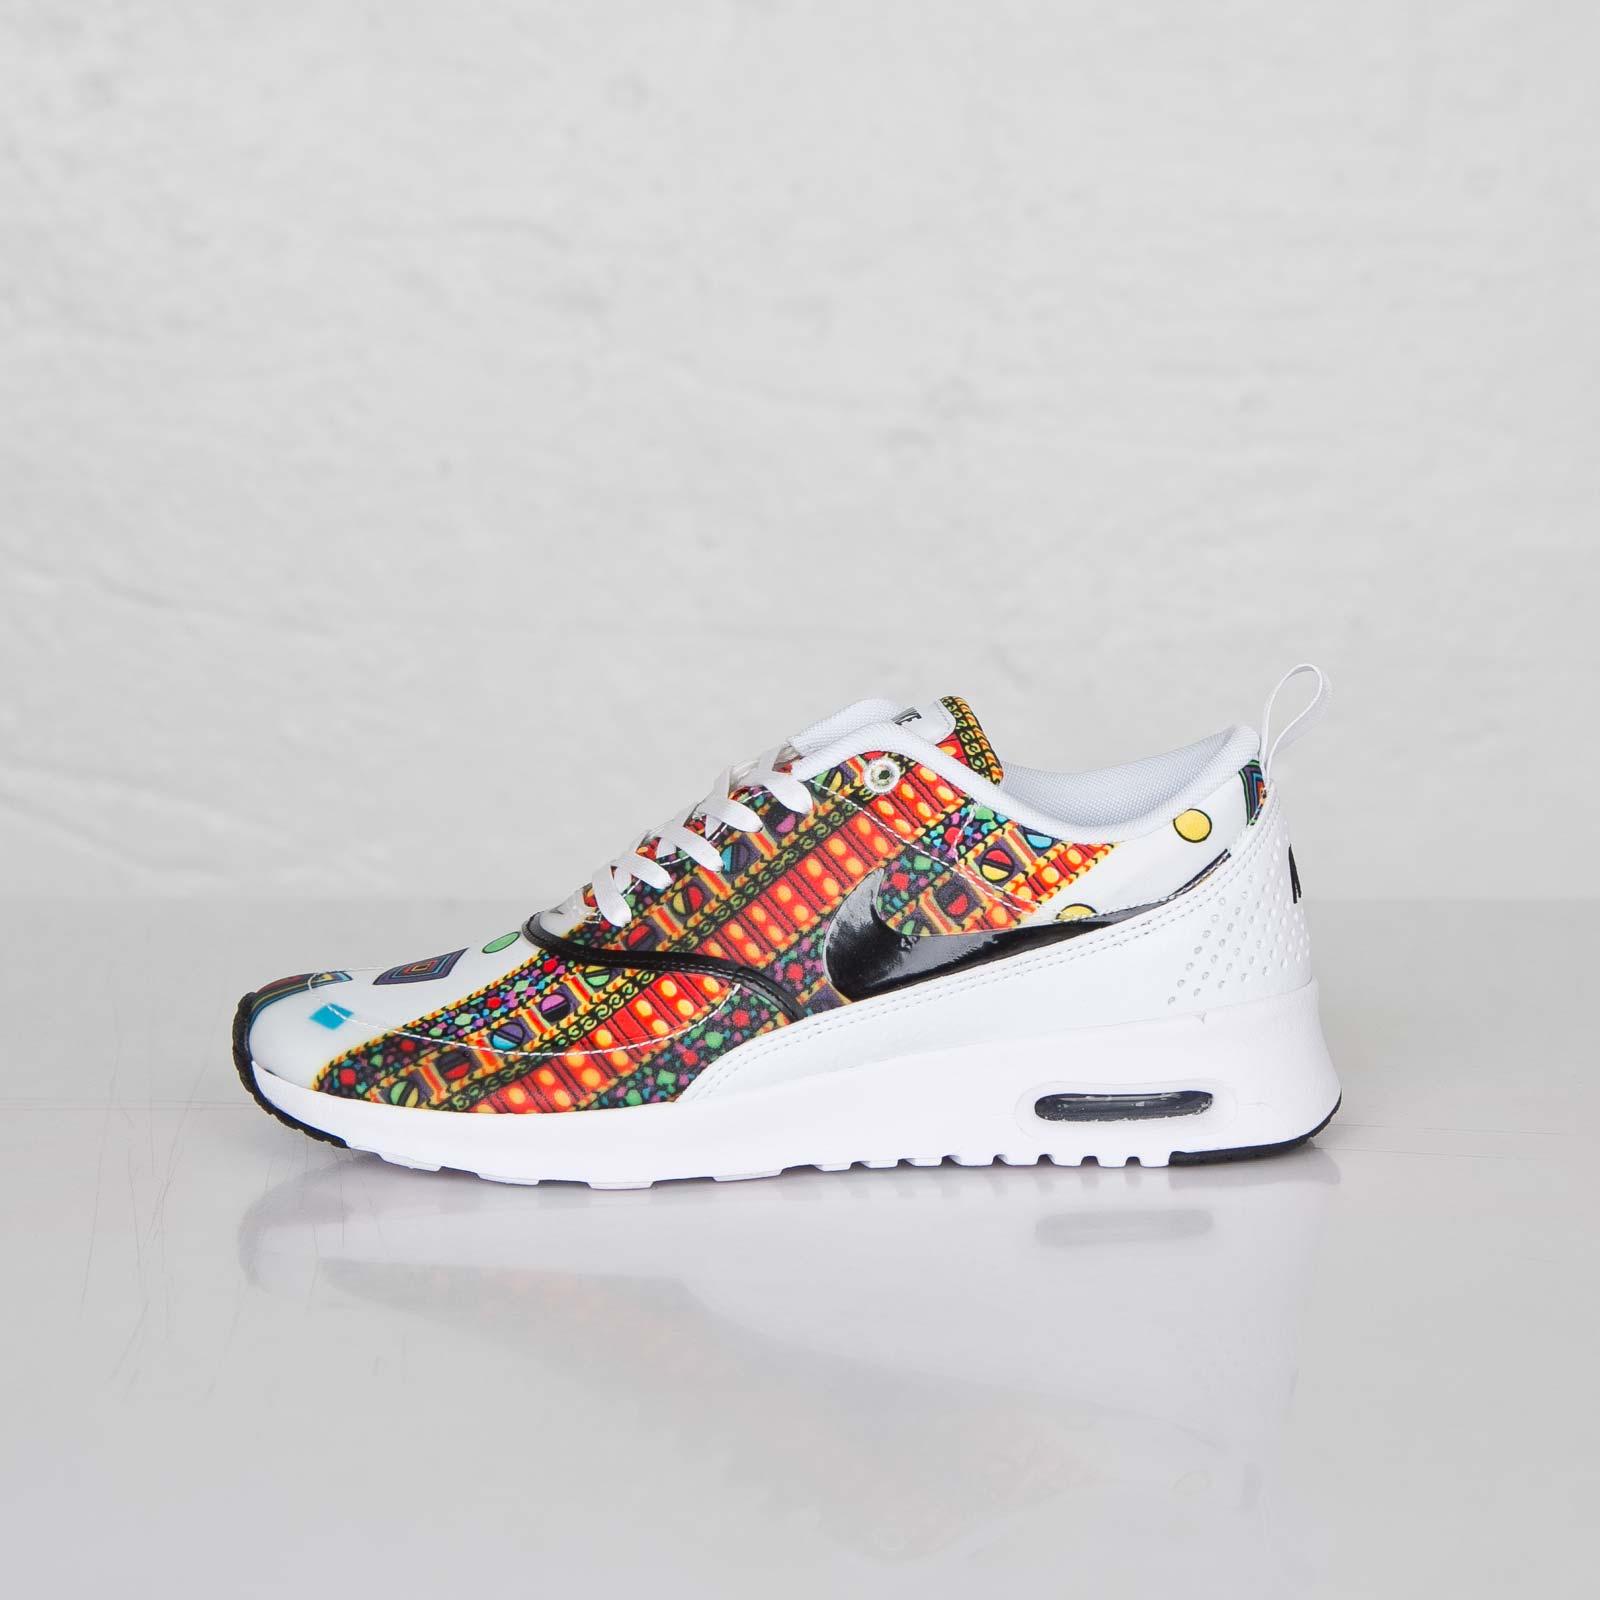 Nike Wmns Air Max Thea Lib QS 746082 100 Sneakersnstuff